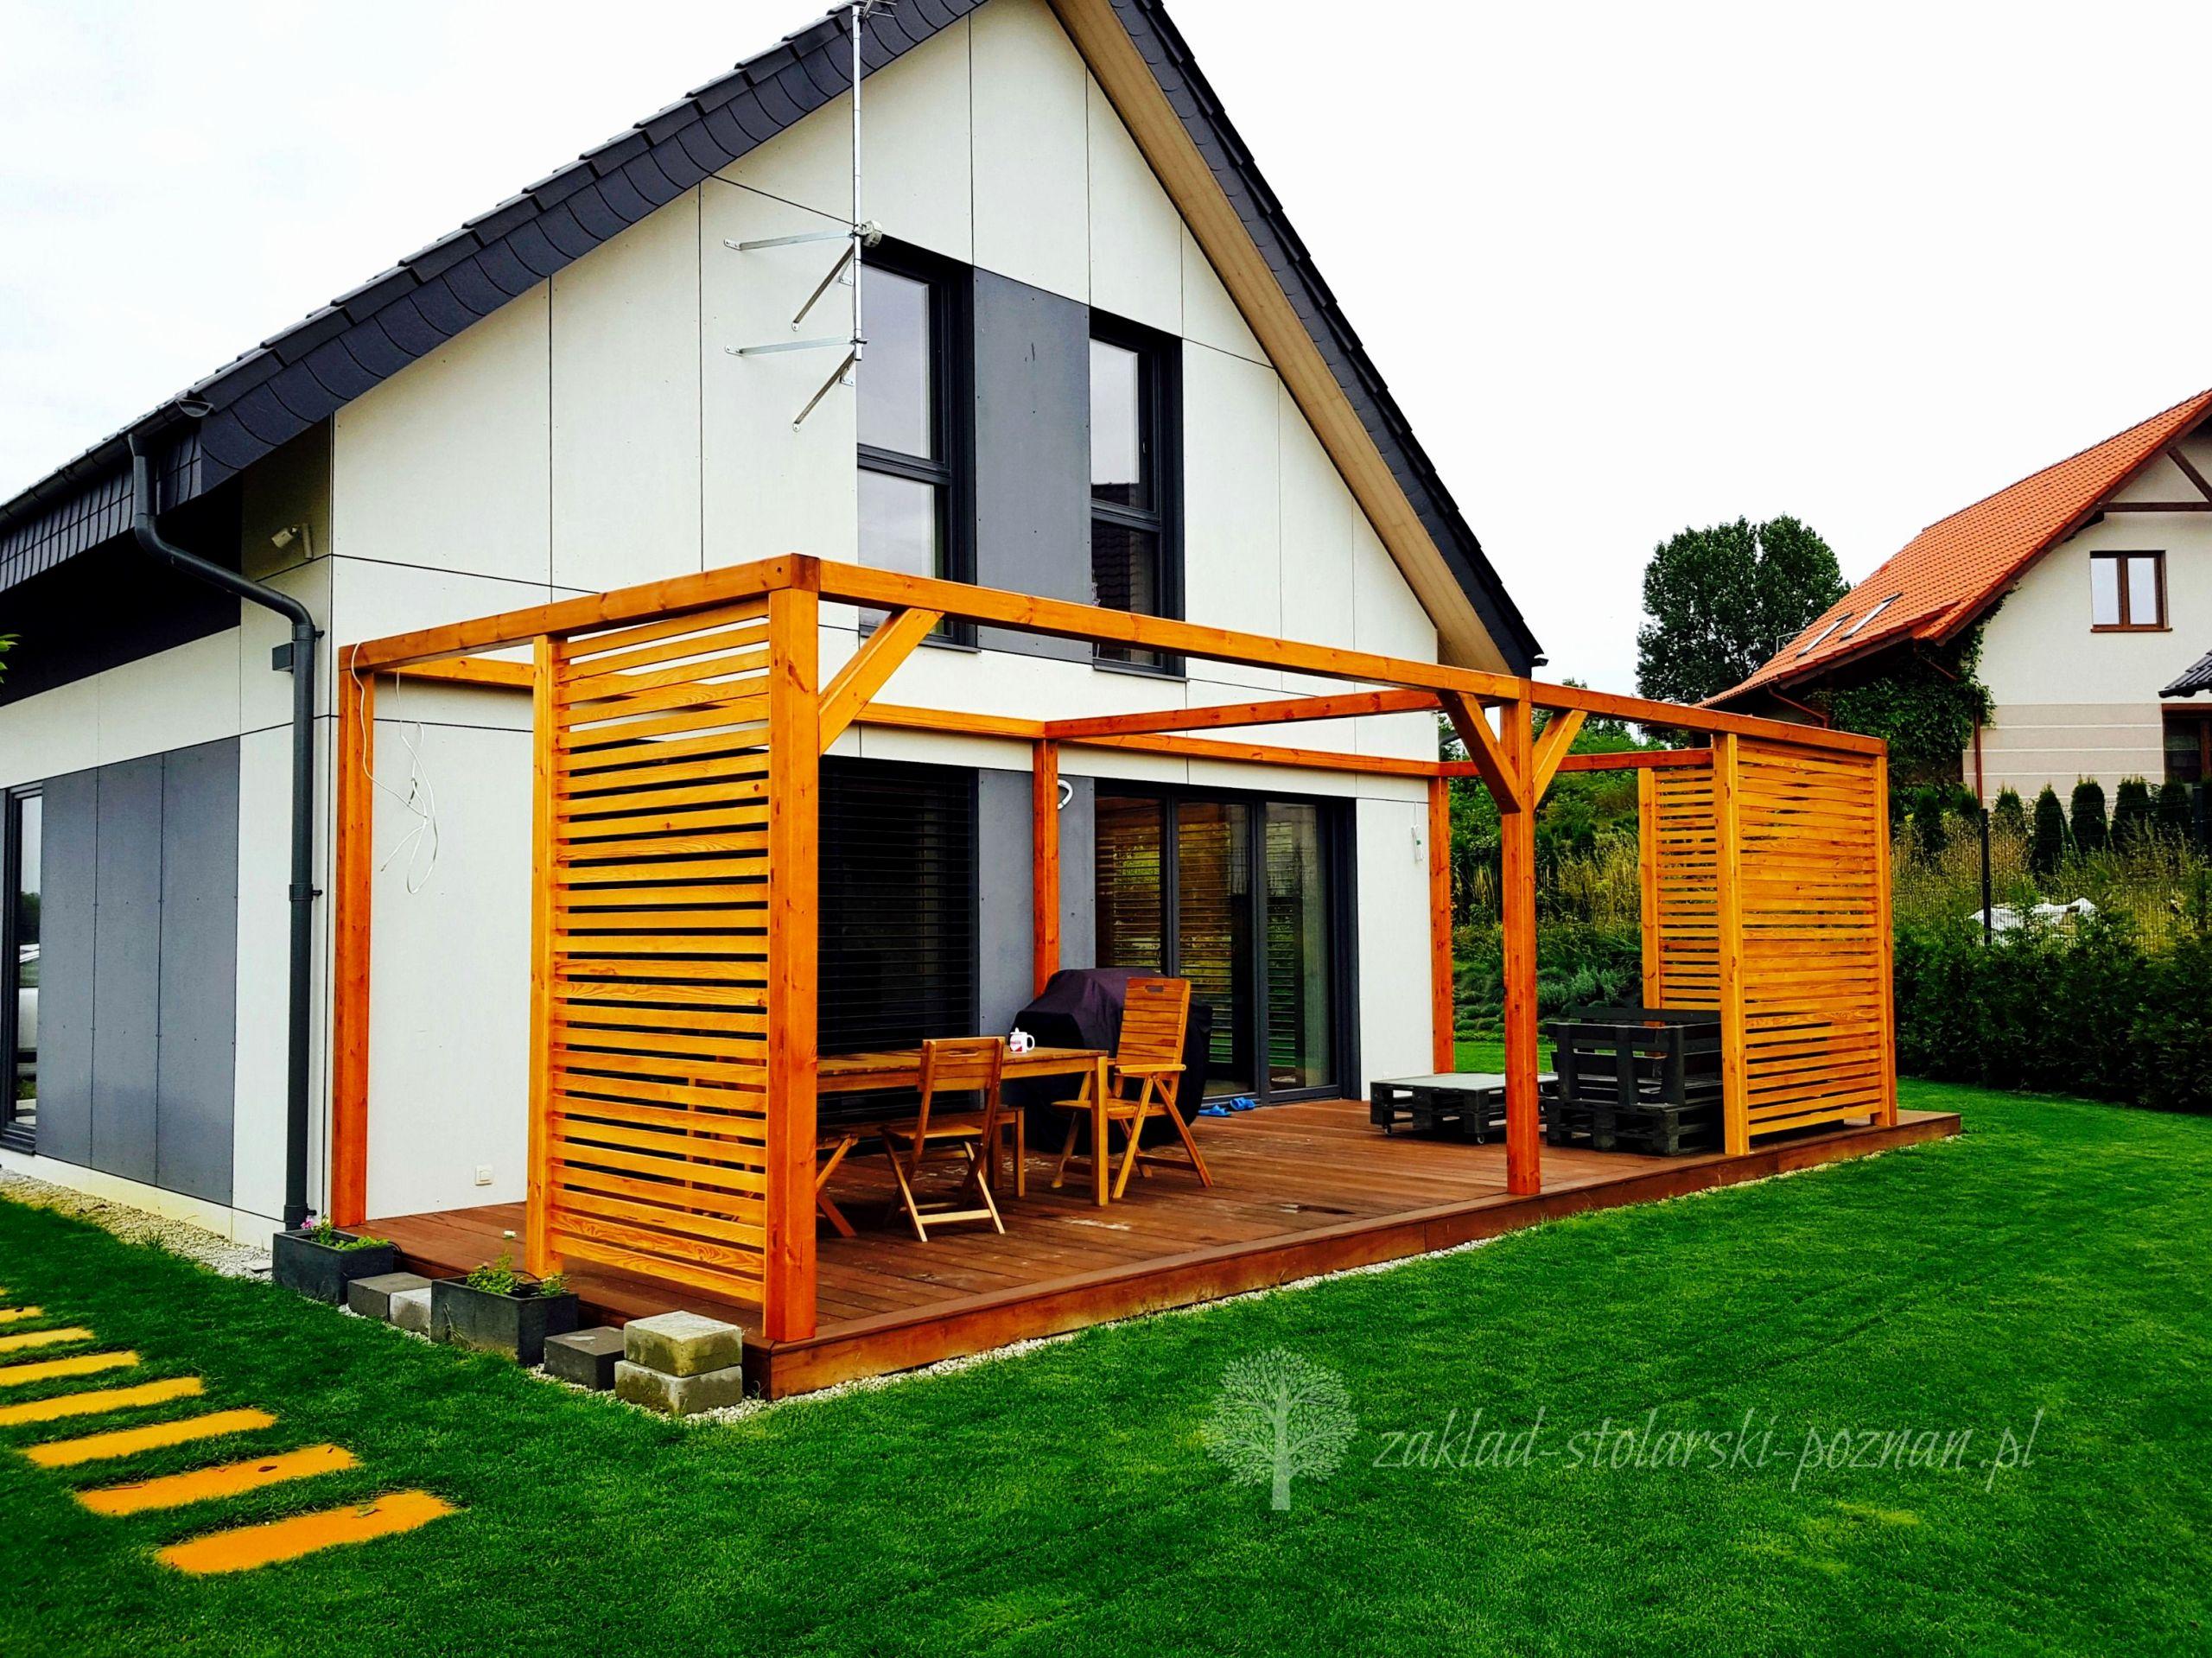 Terrasse Beet Gestalten Frisch Terrasse Anlegen Ideen Frisch Garten Beete Inspirierend